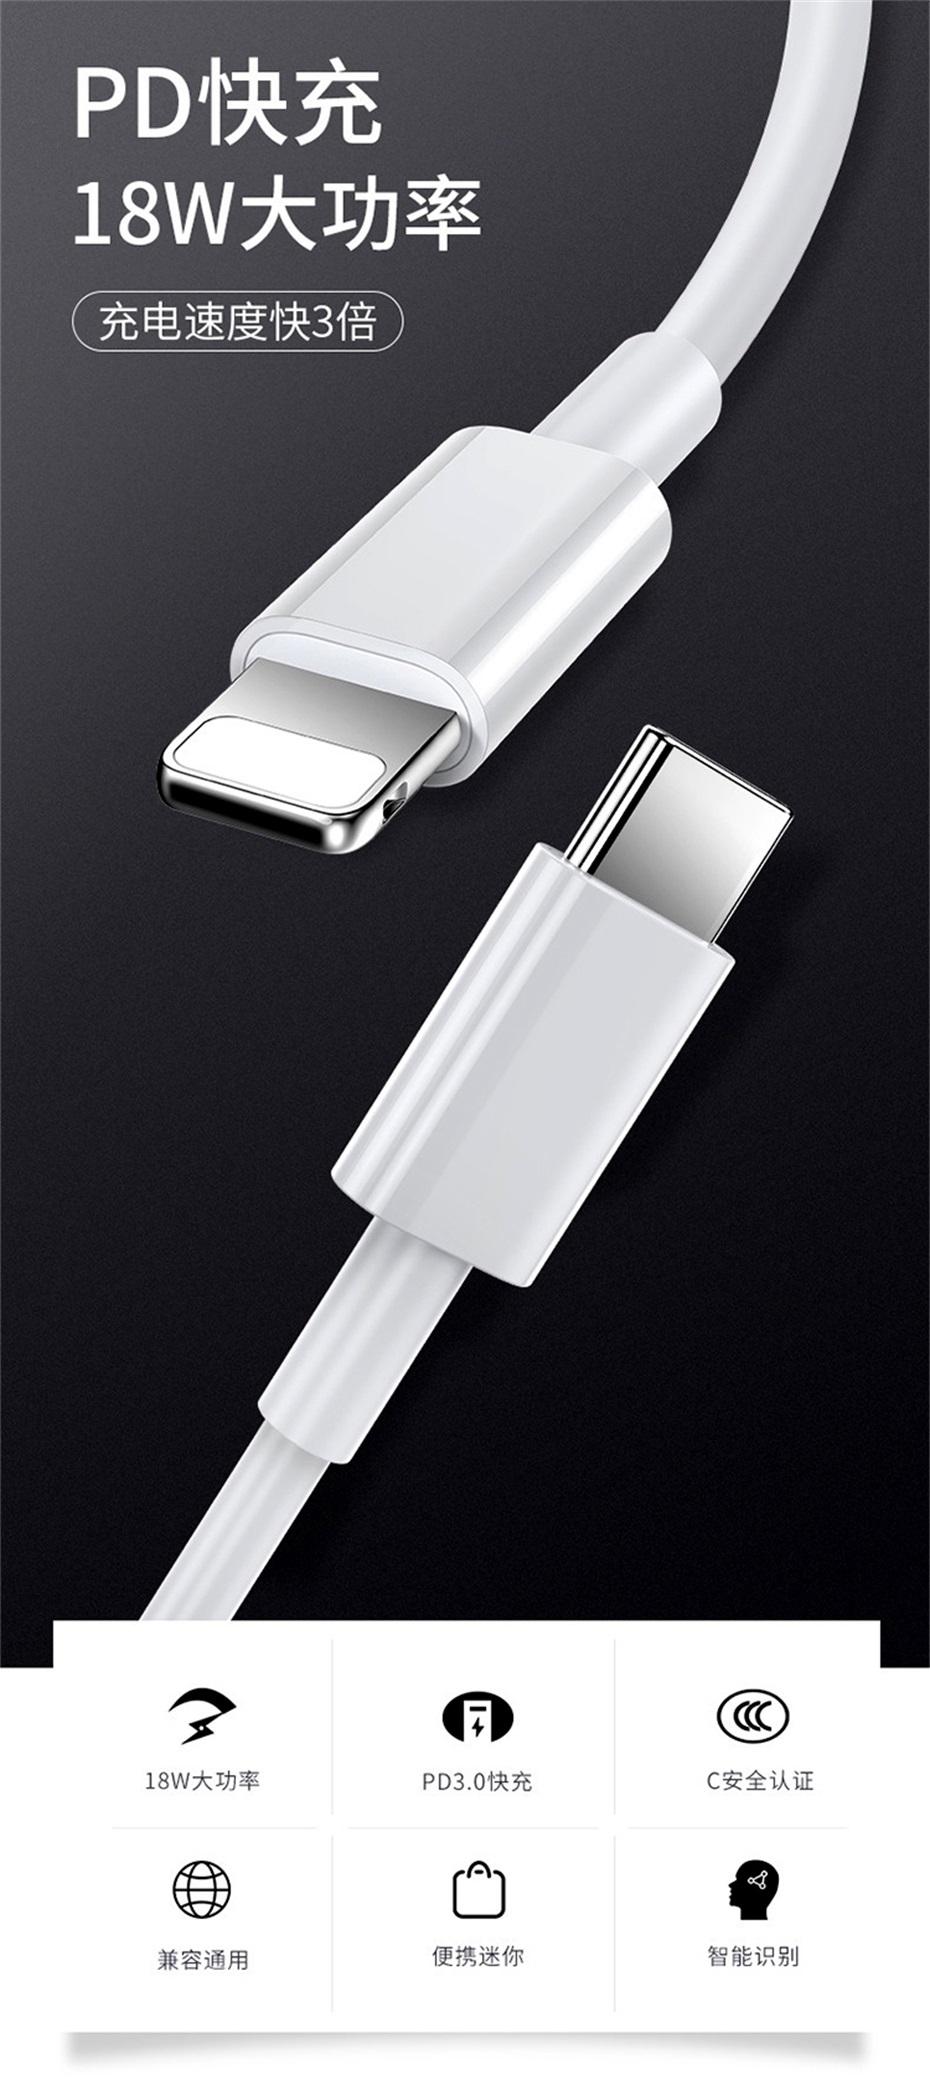 pd苹果数据线